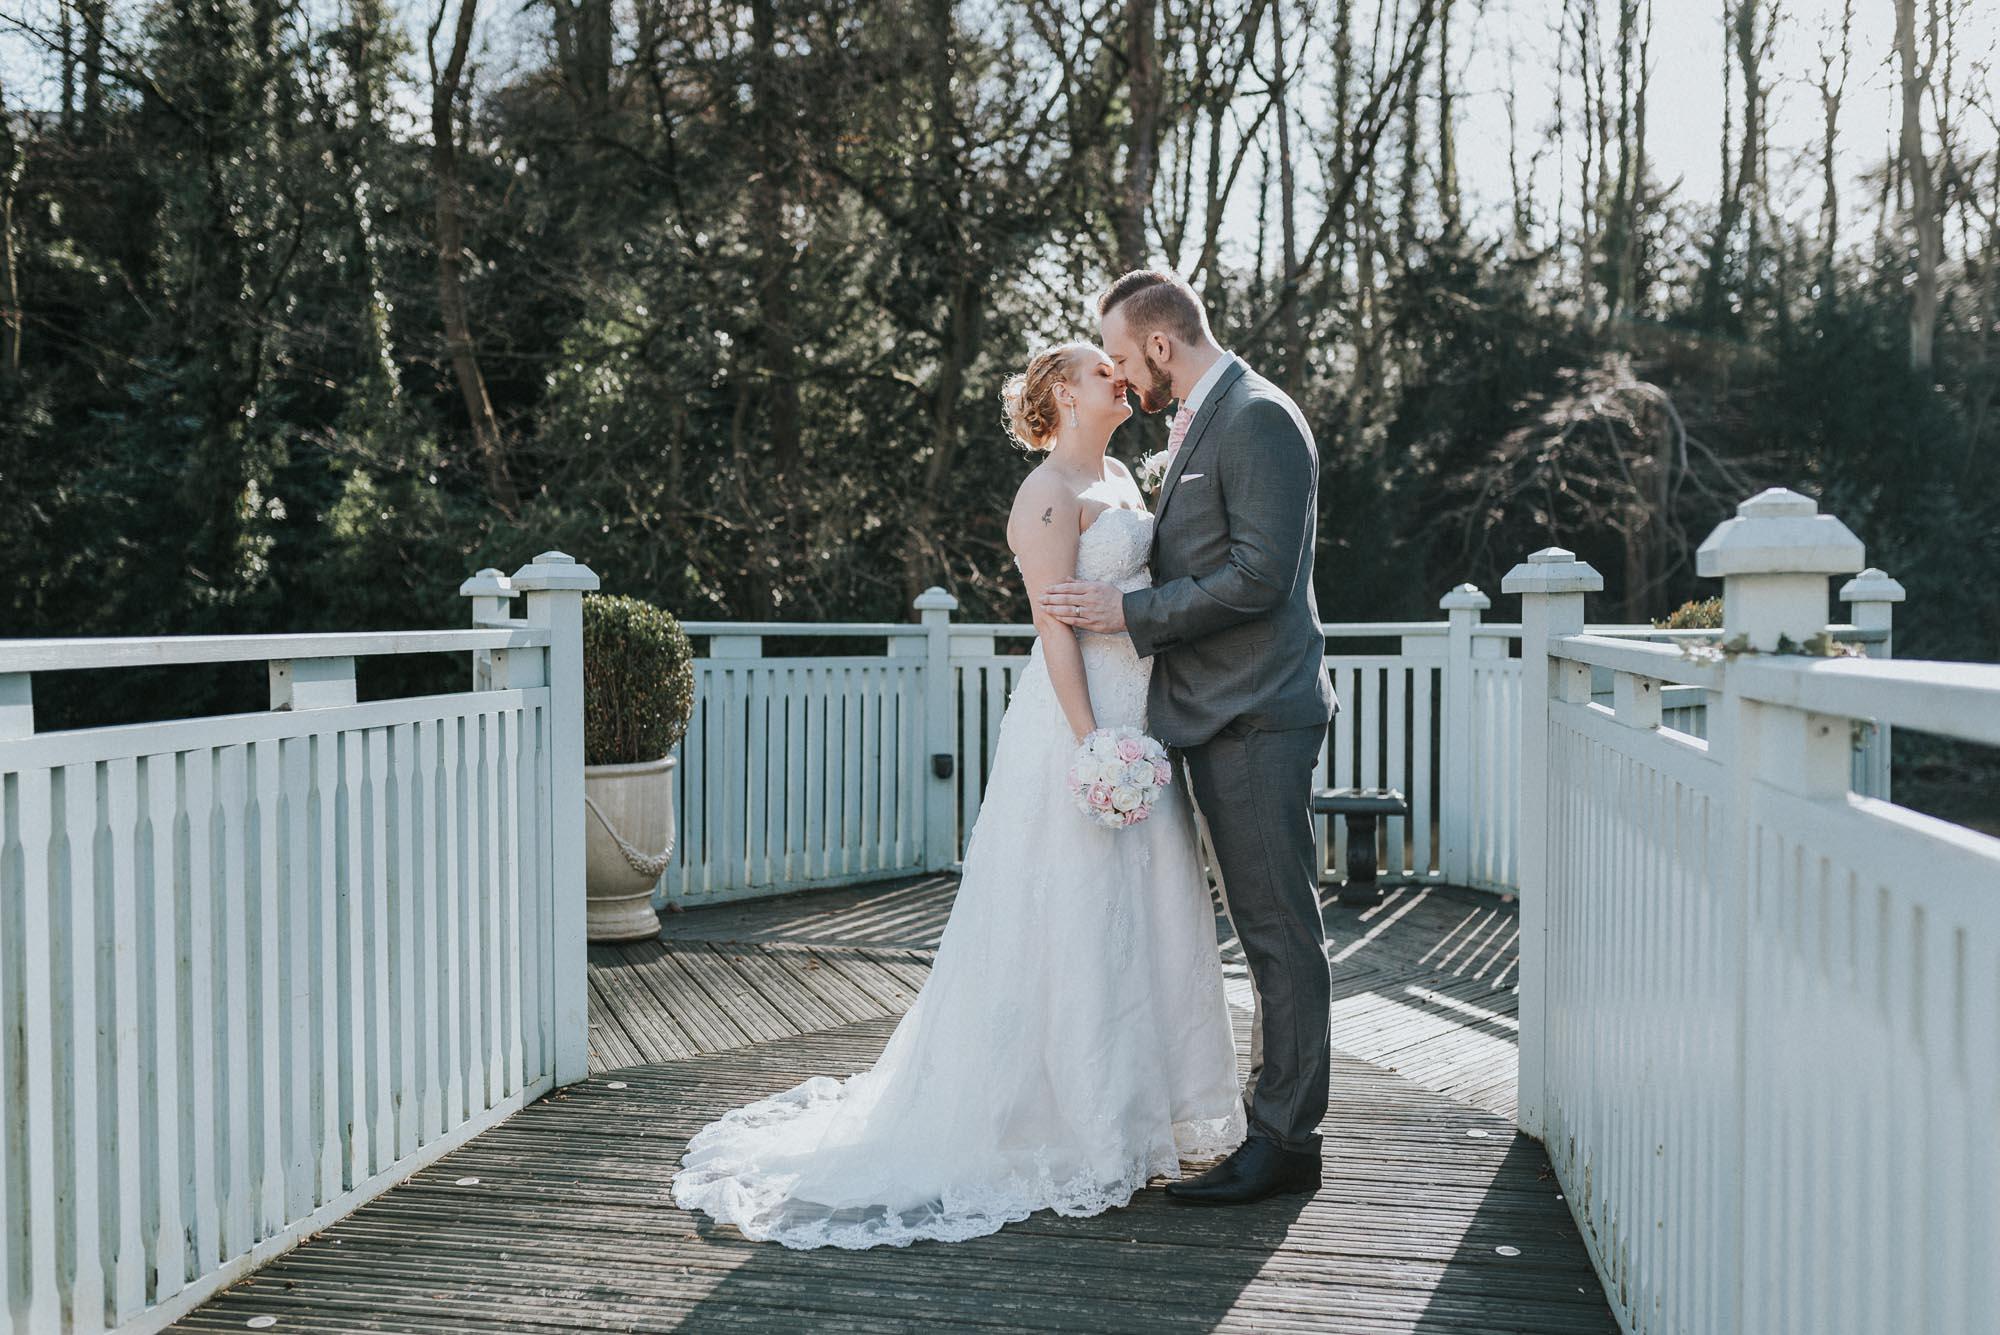 Whitley Hall Hotel Wedding